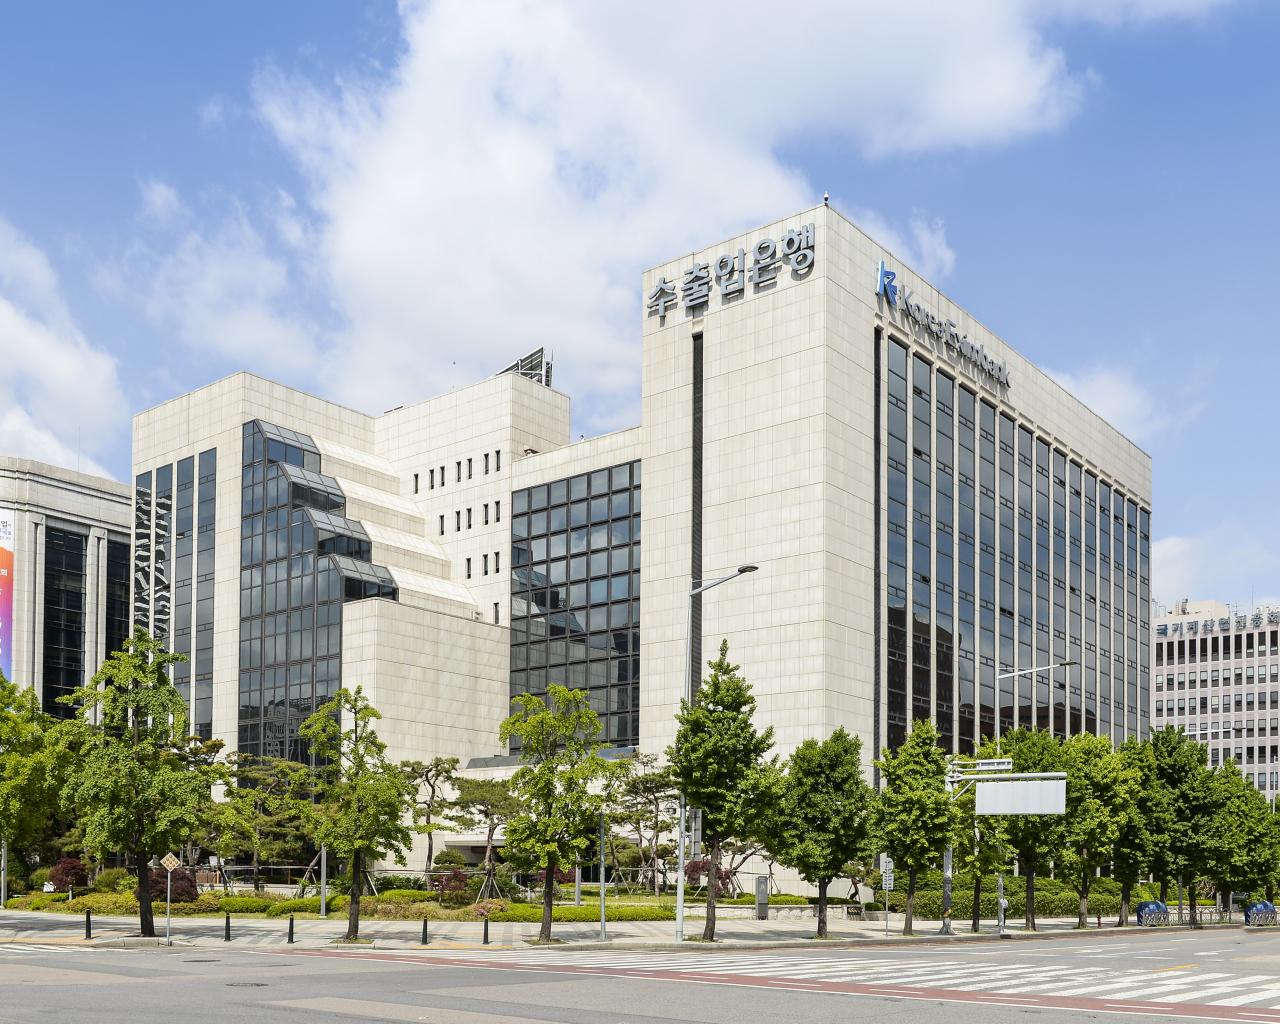 Headquarters of the Export-Import Bank of Korea (Eximbank)